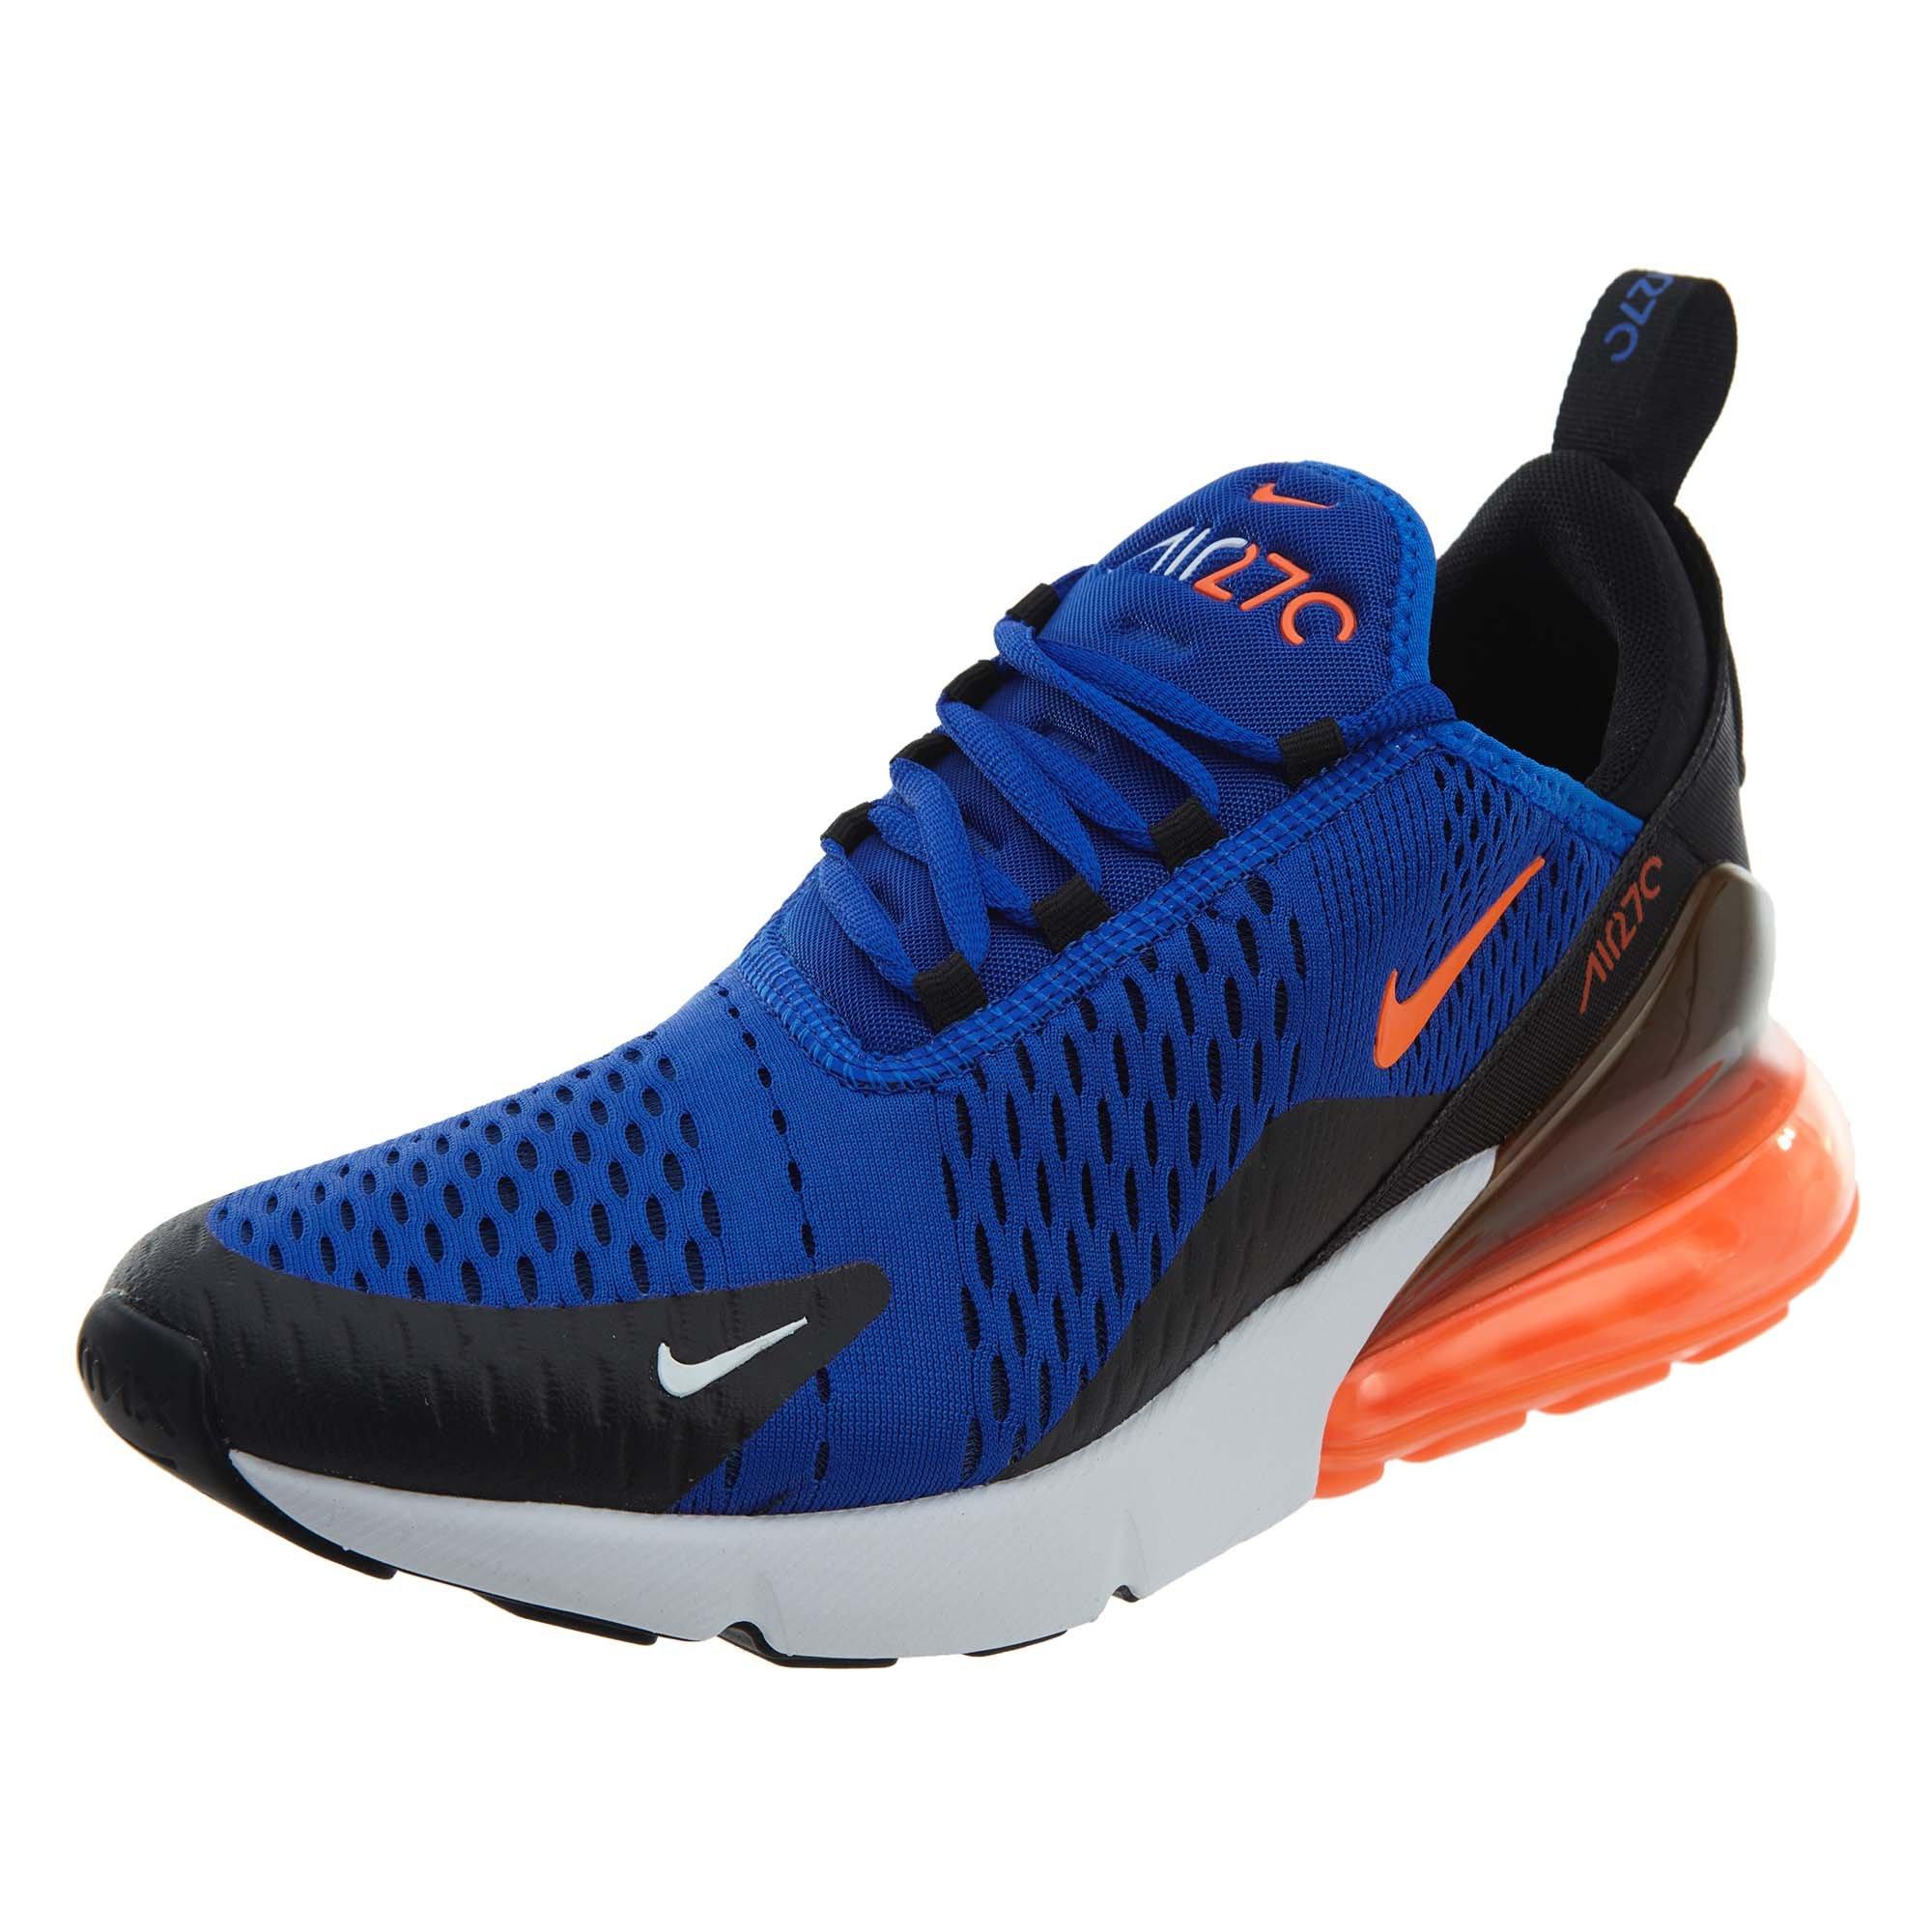 Nike Men's Air Max 270 Running Shoes (13)